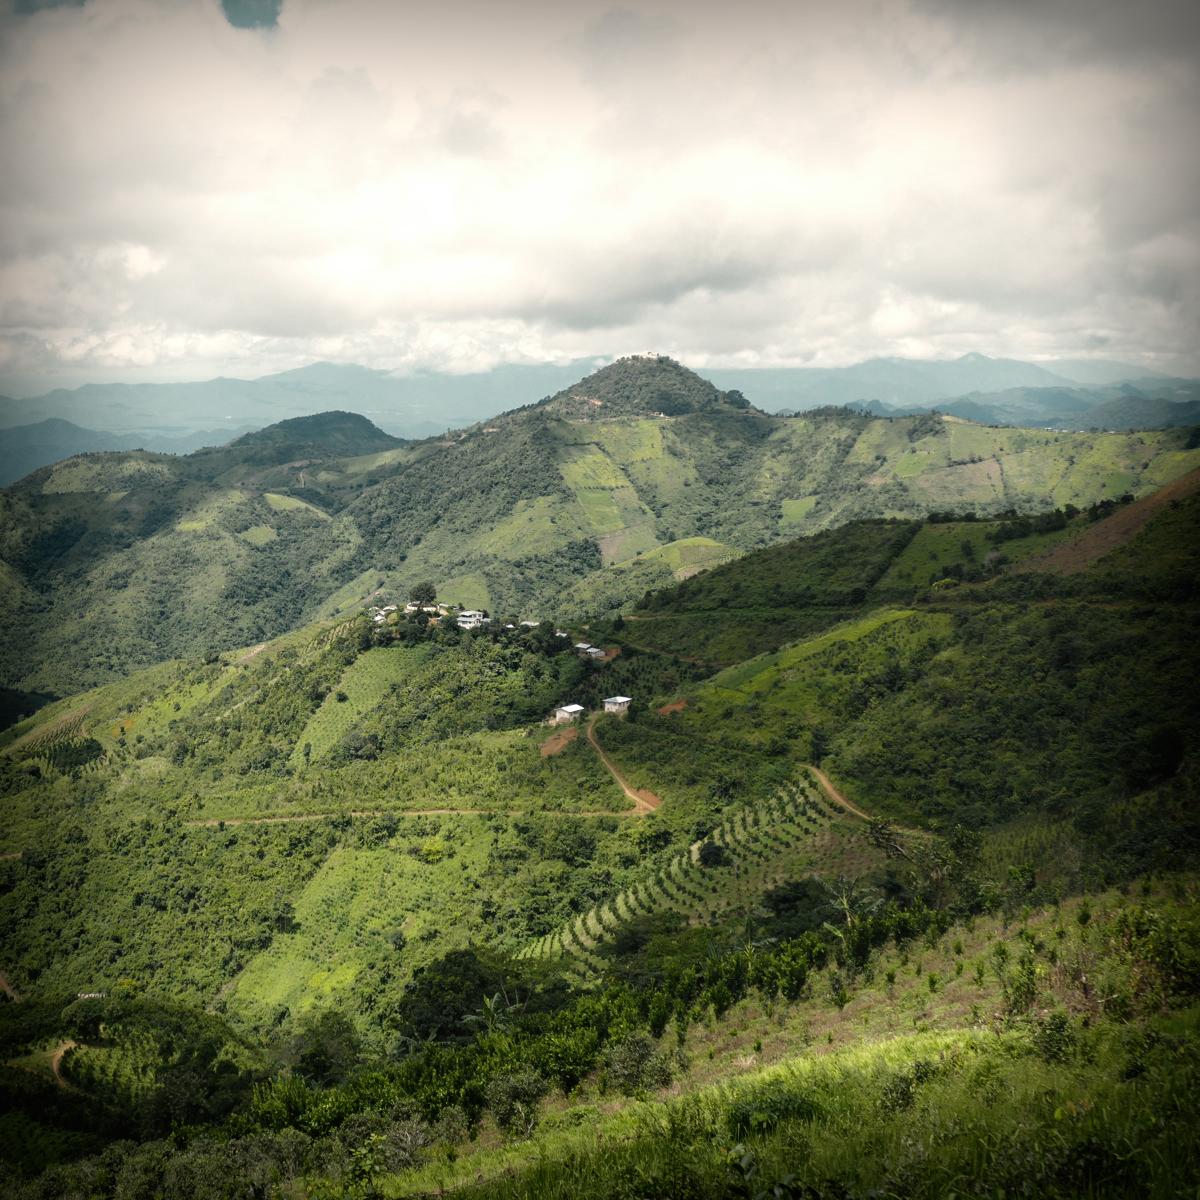 Mountains of eastern Myanmar recede into the distance. Noah Strycker